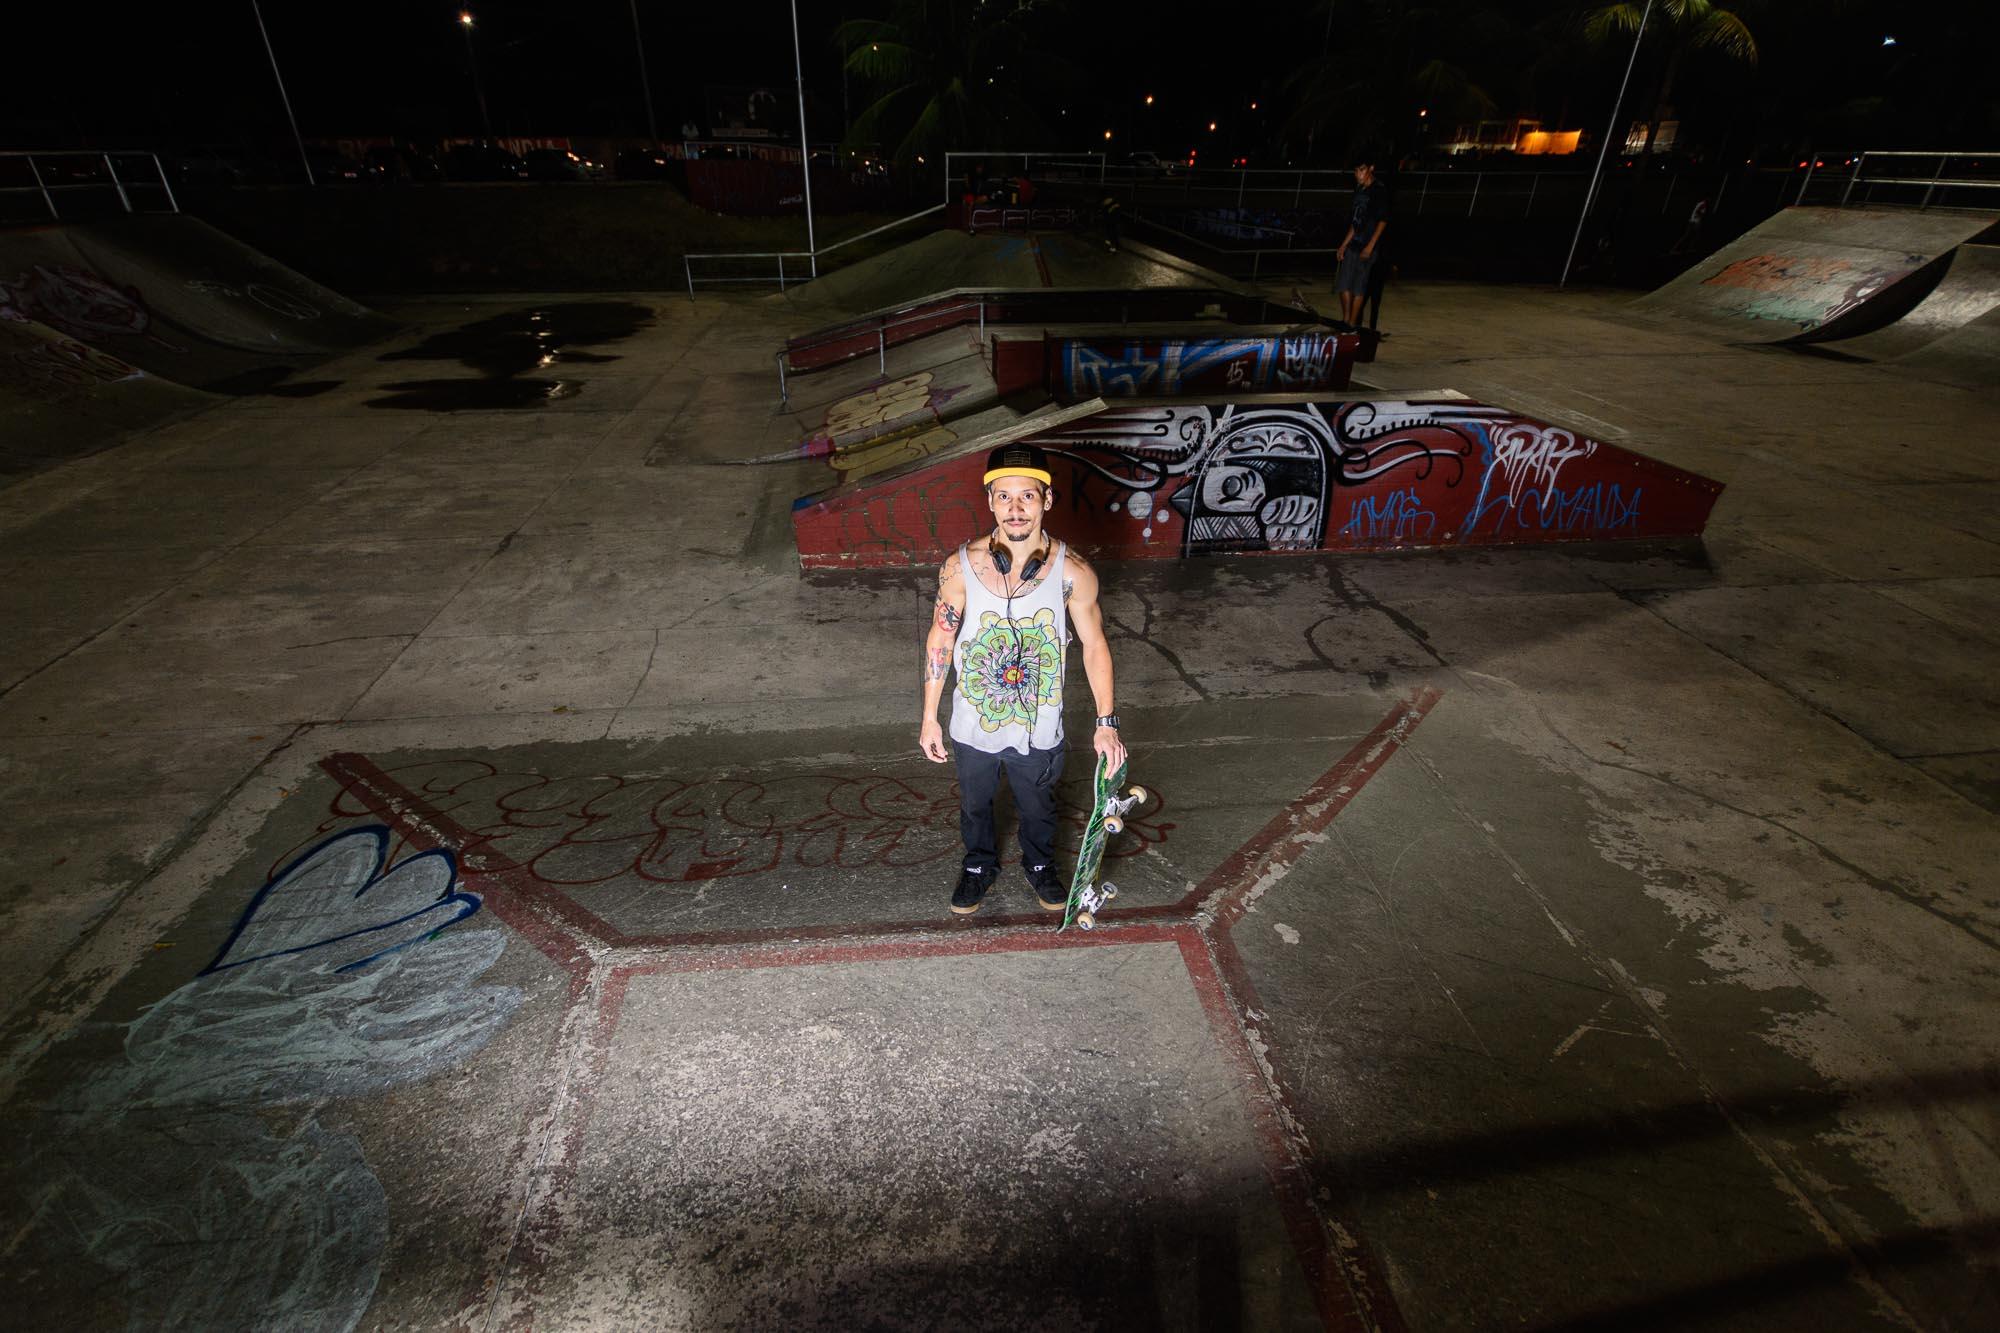 Greg Lee Skateboarder im Park